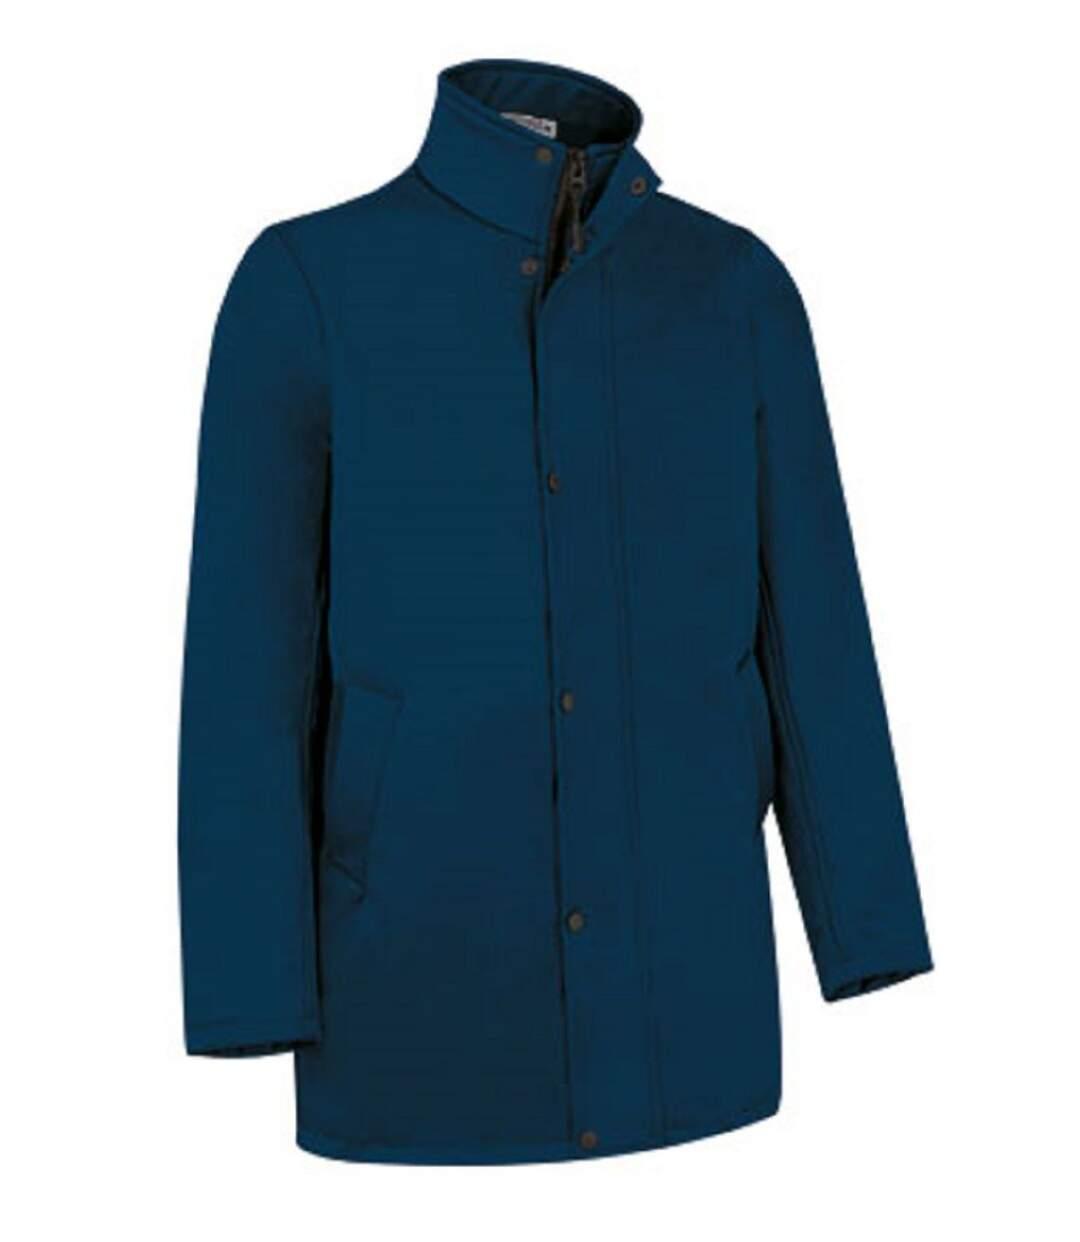 Parka softshell - Homme - REF DALLAS - bleu marine